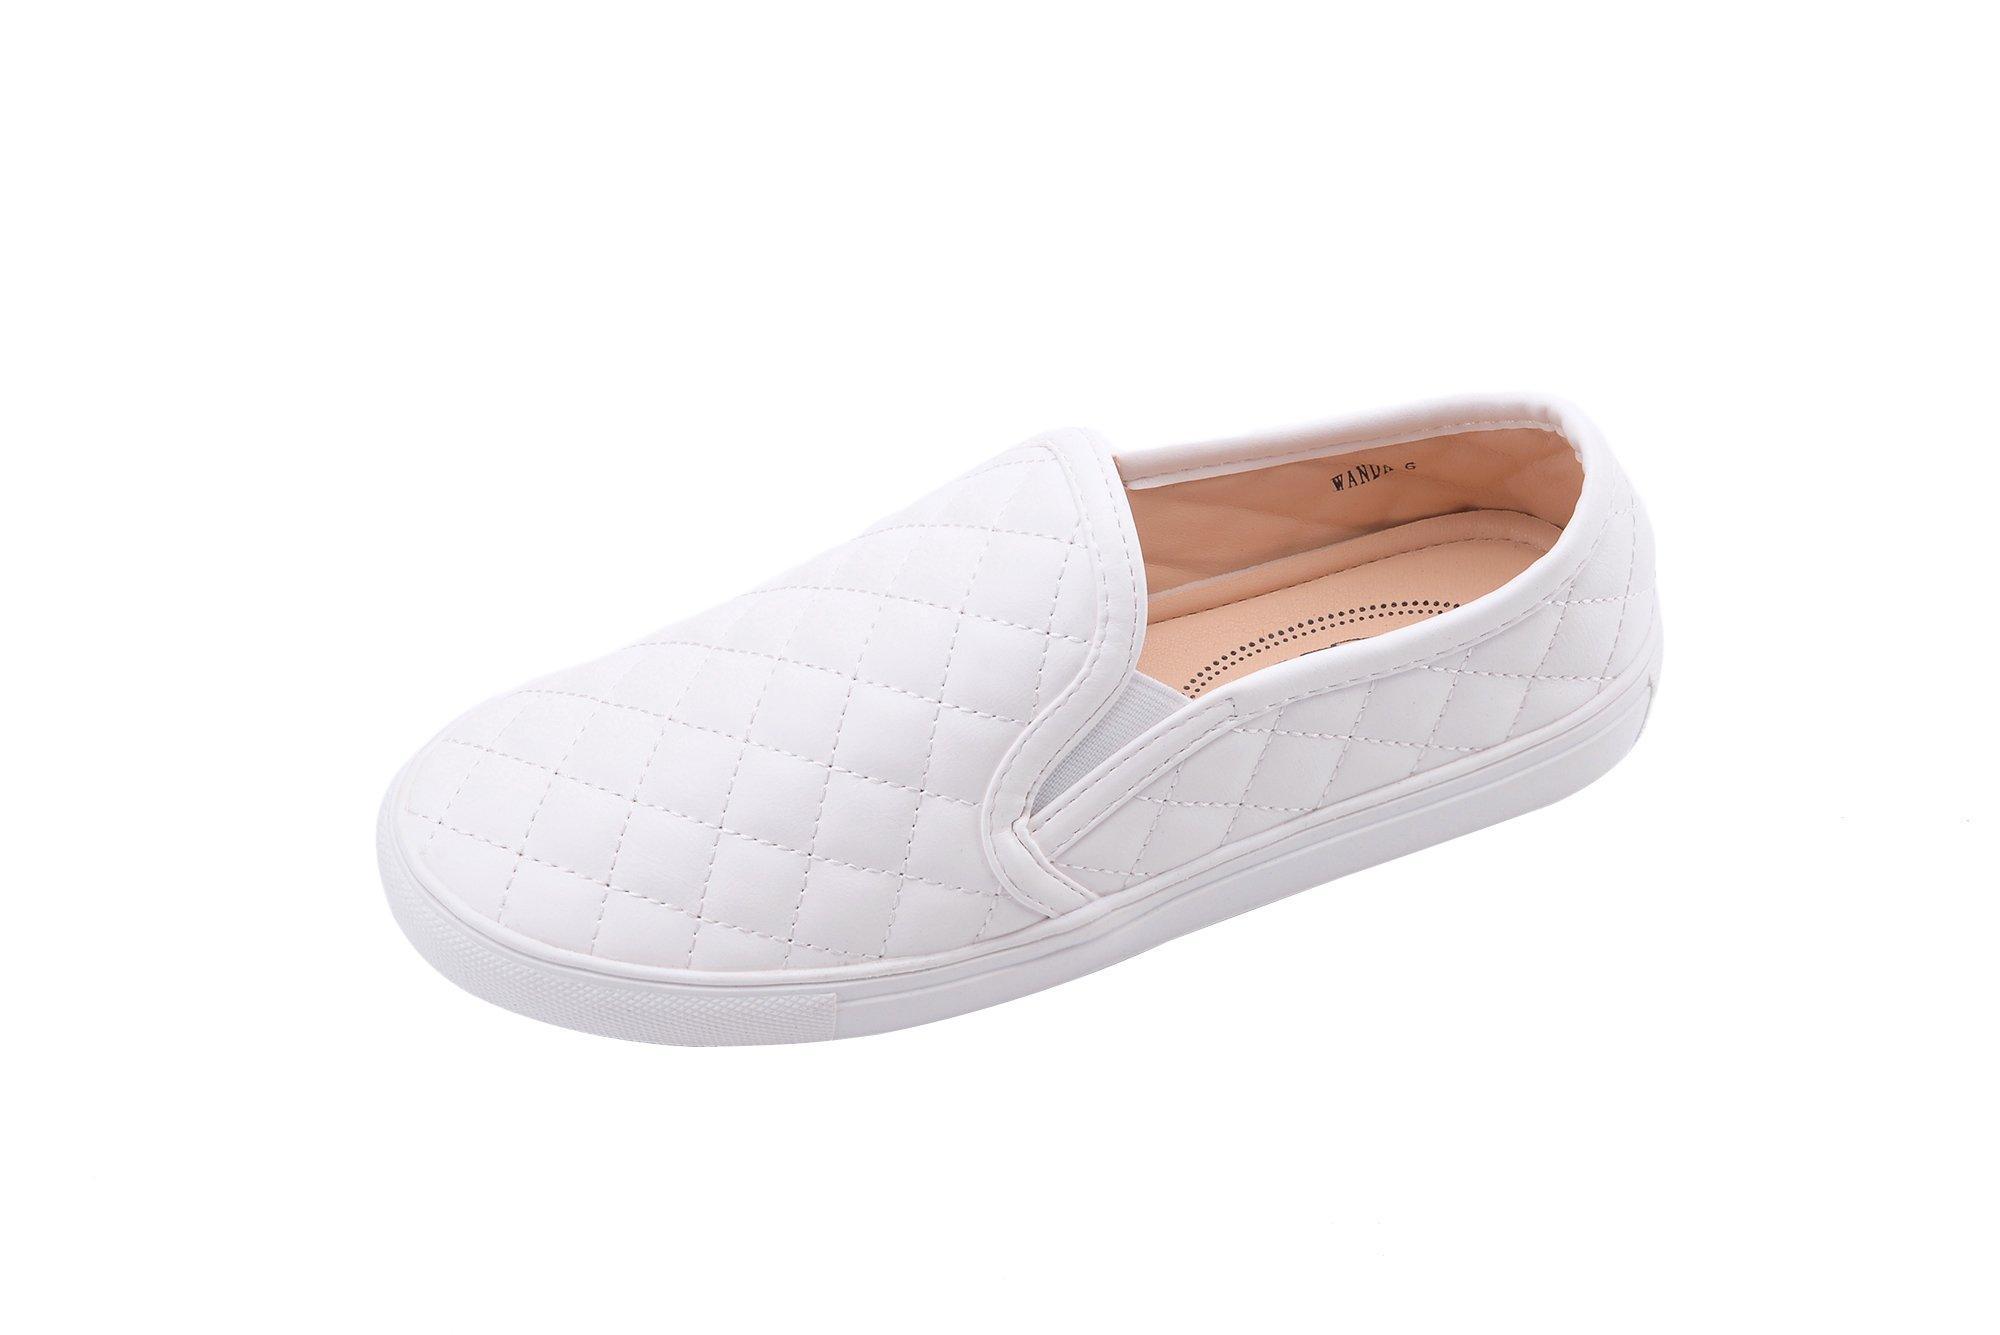 GREENS Wanta Women Canvas Fierce Quilt Pattern Slip On Fashion Sneakers, White 10